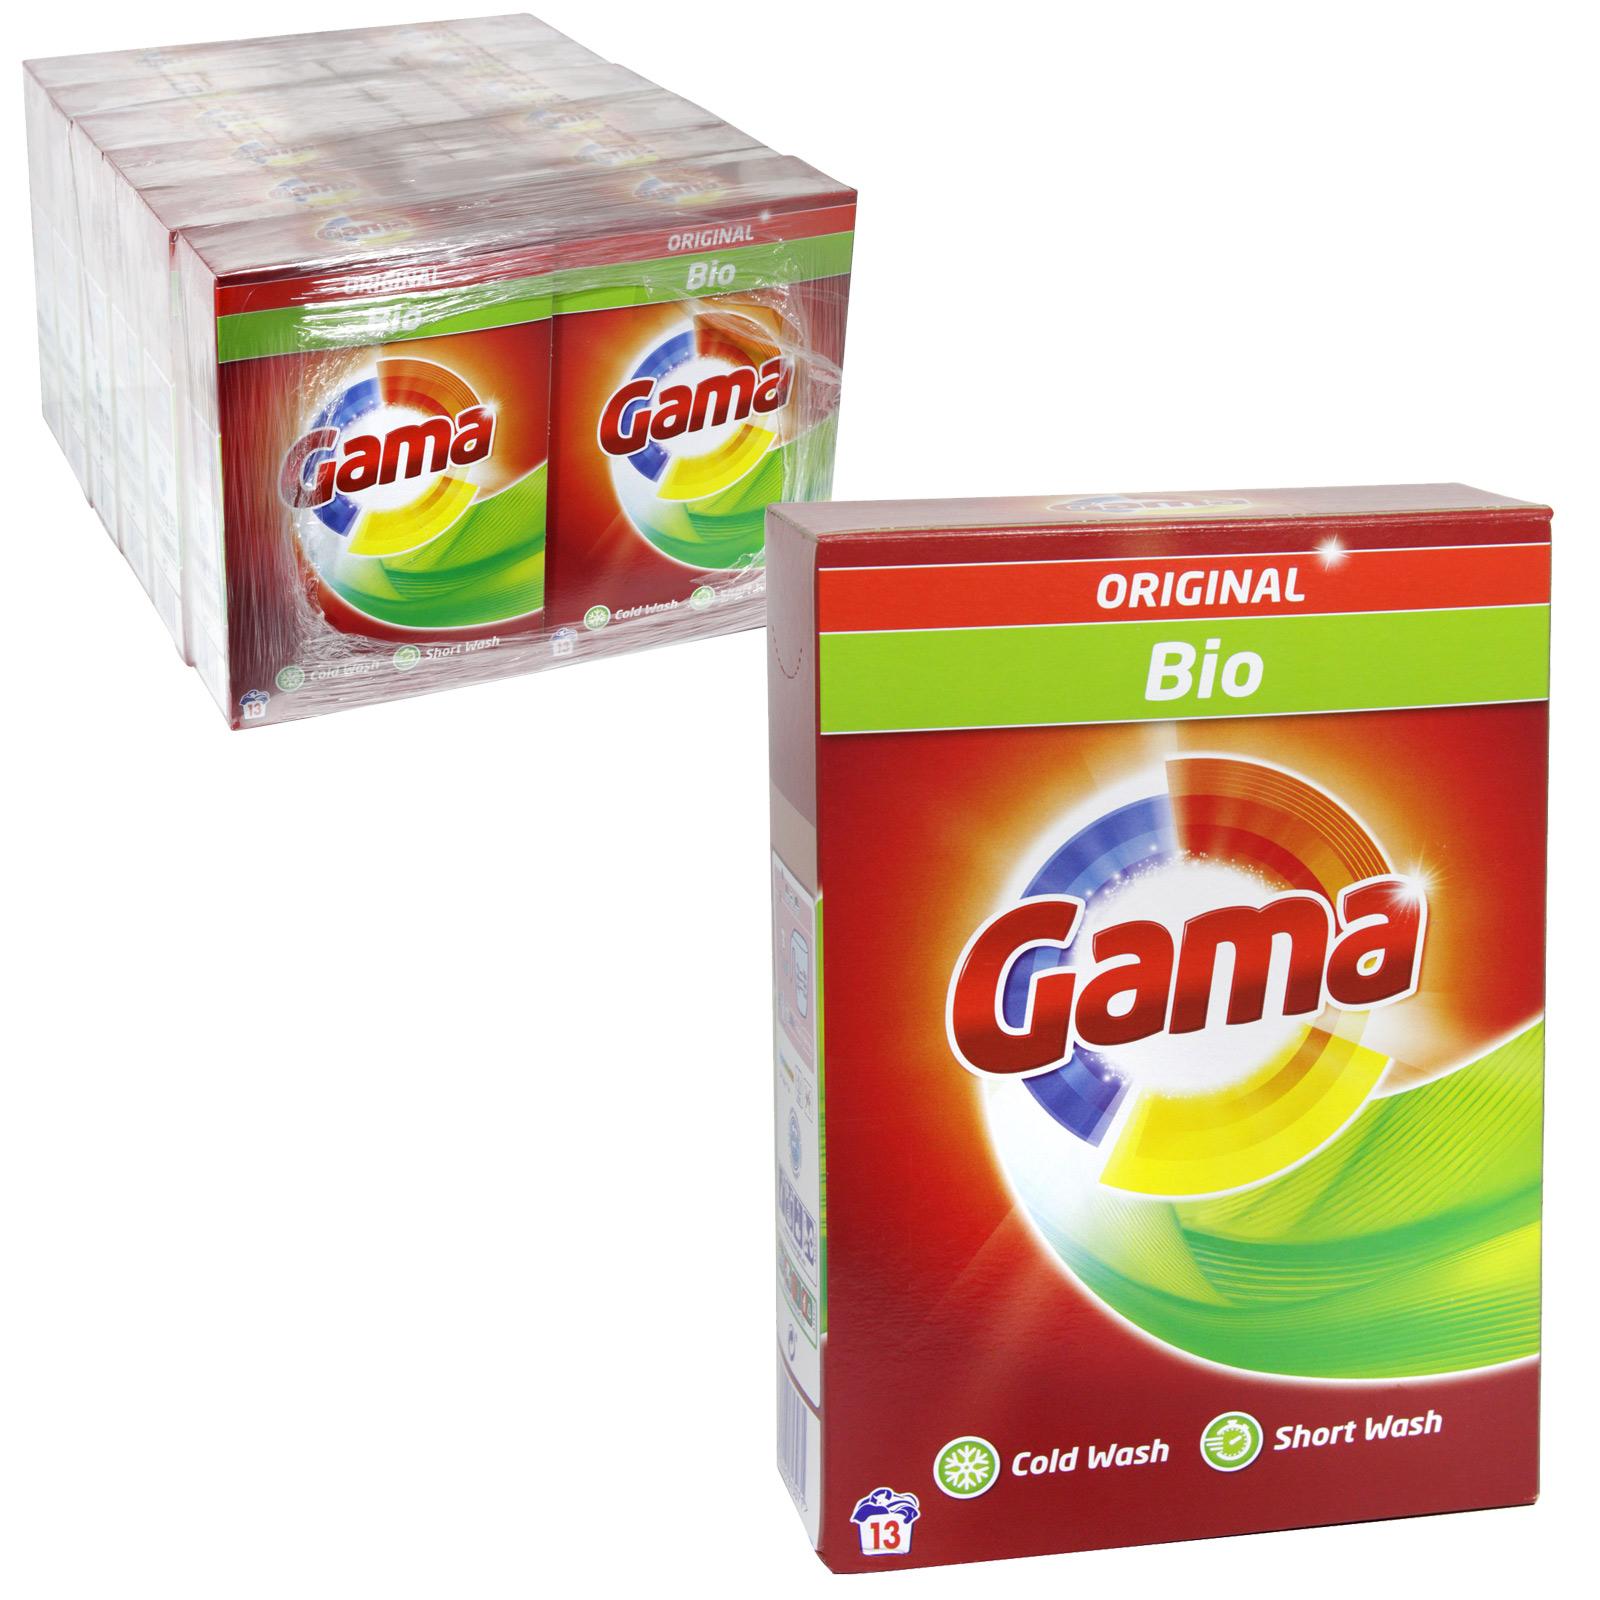 GAMA 13 WASH LAUNDRY POWDER 845GM BIO X12